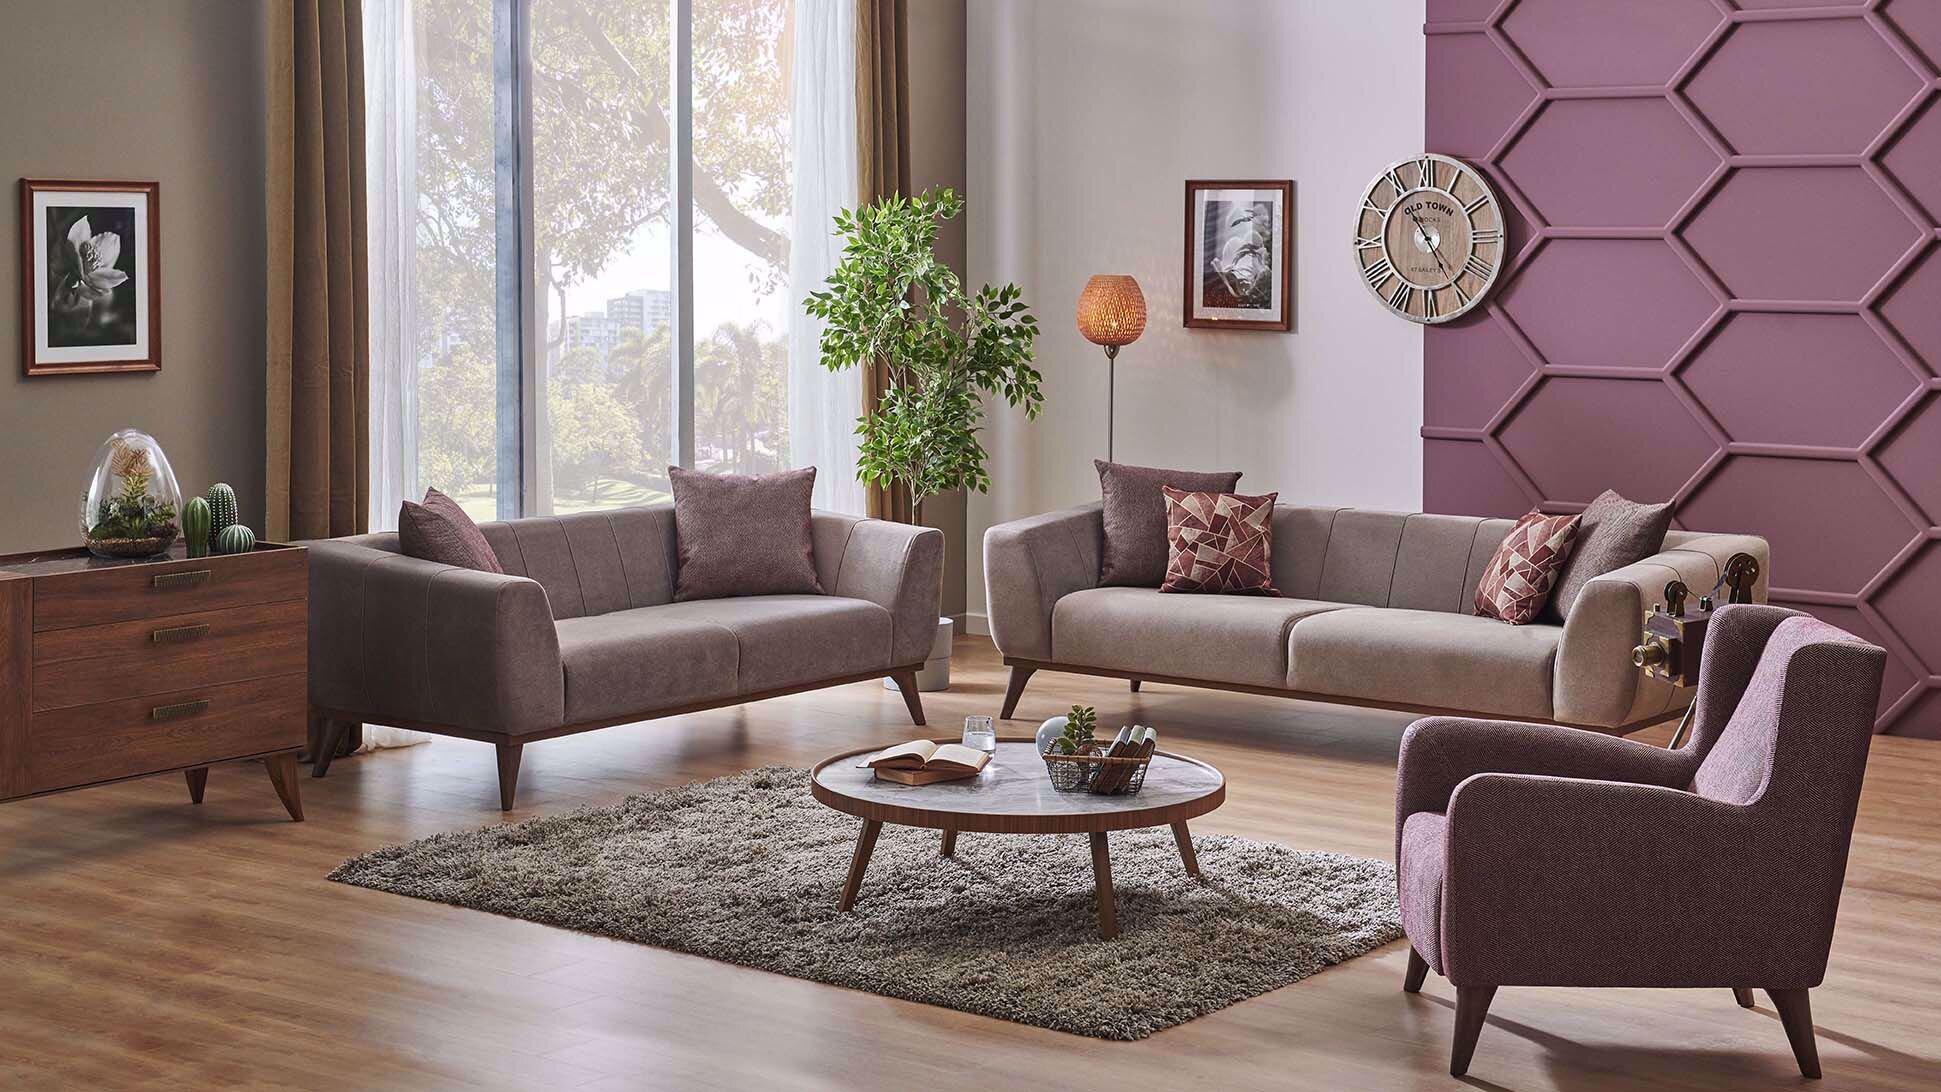 Palemo Two-Seat Sofa